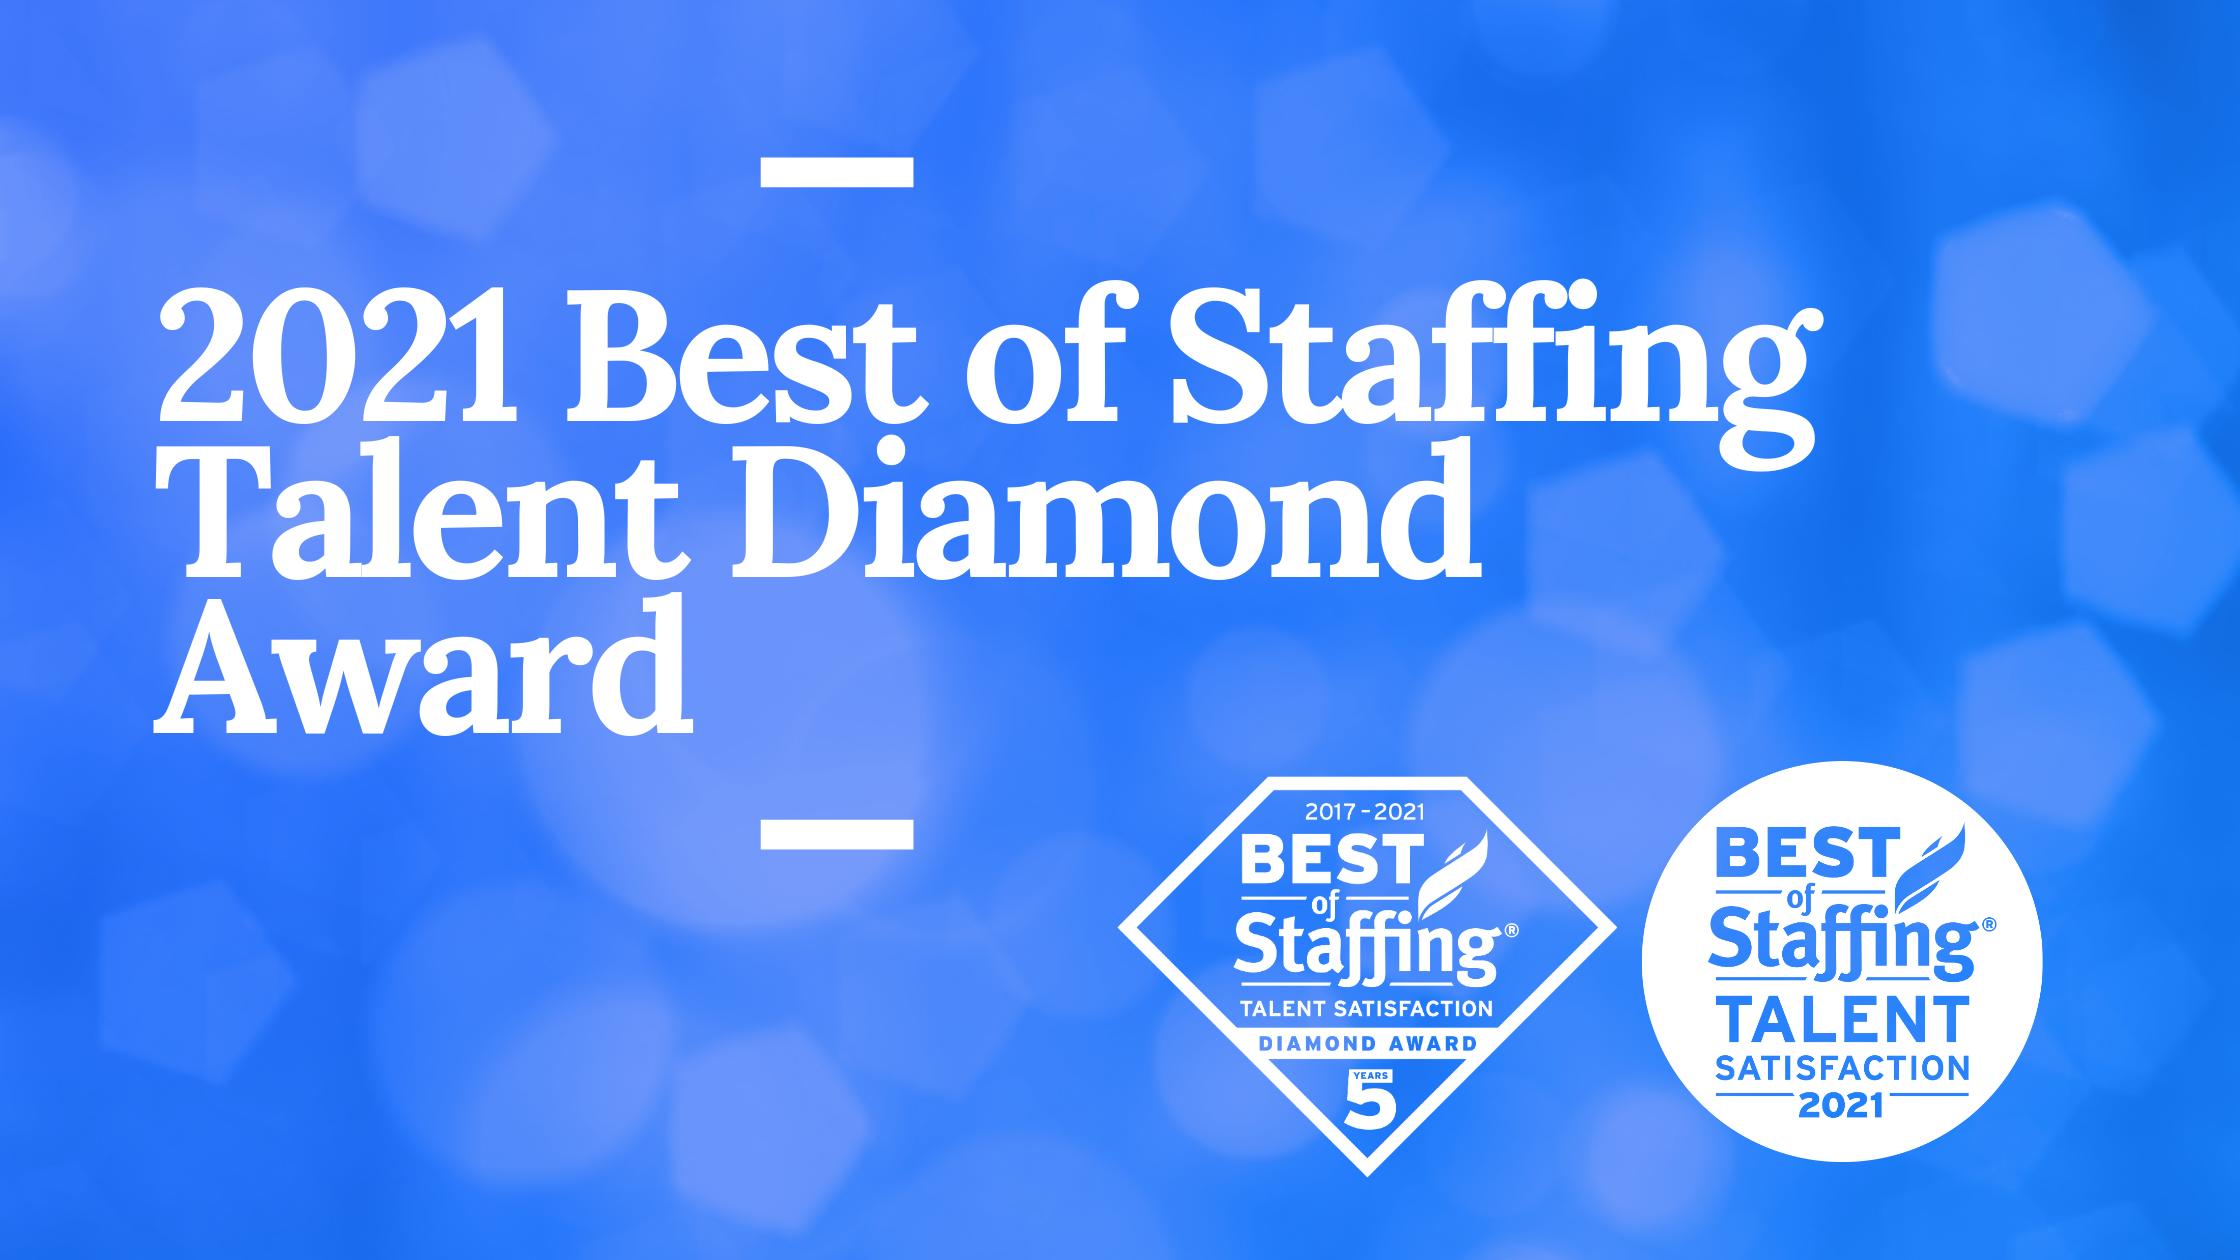 2021 Best of Staffing Talent Diamond Award